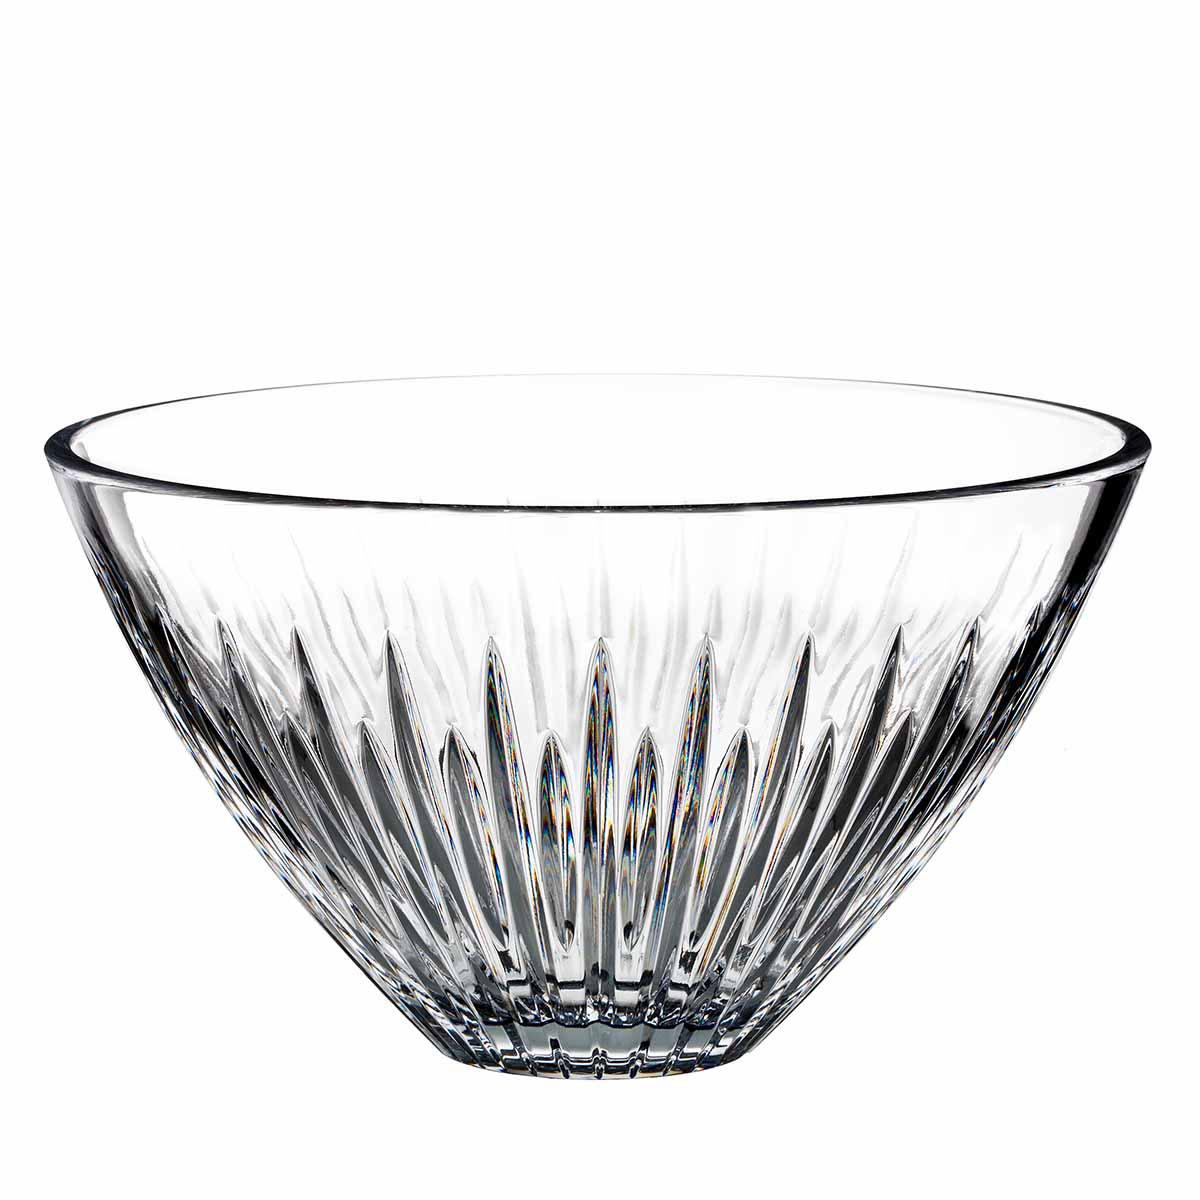 "Waterford Crystal, Ardan Mara 9"" Bowl"